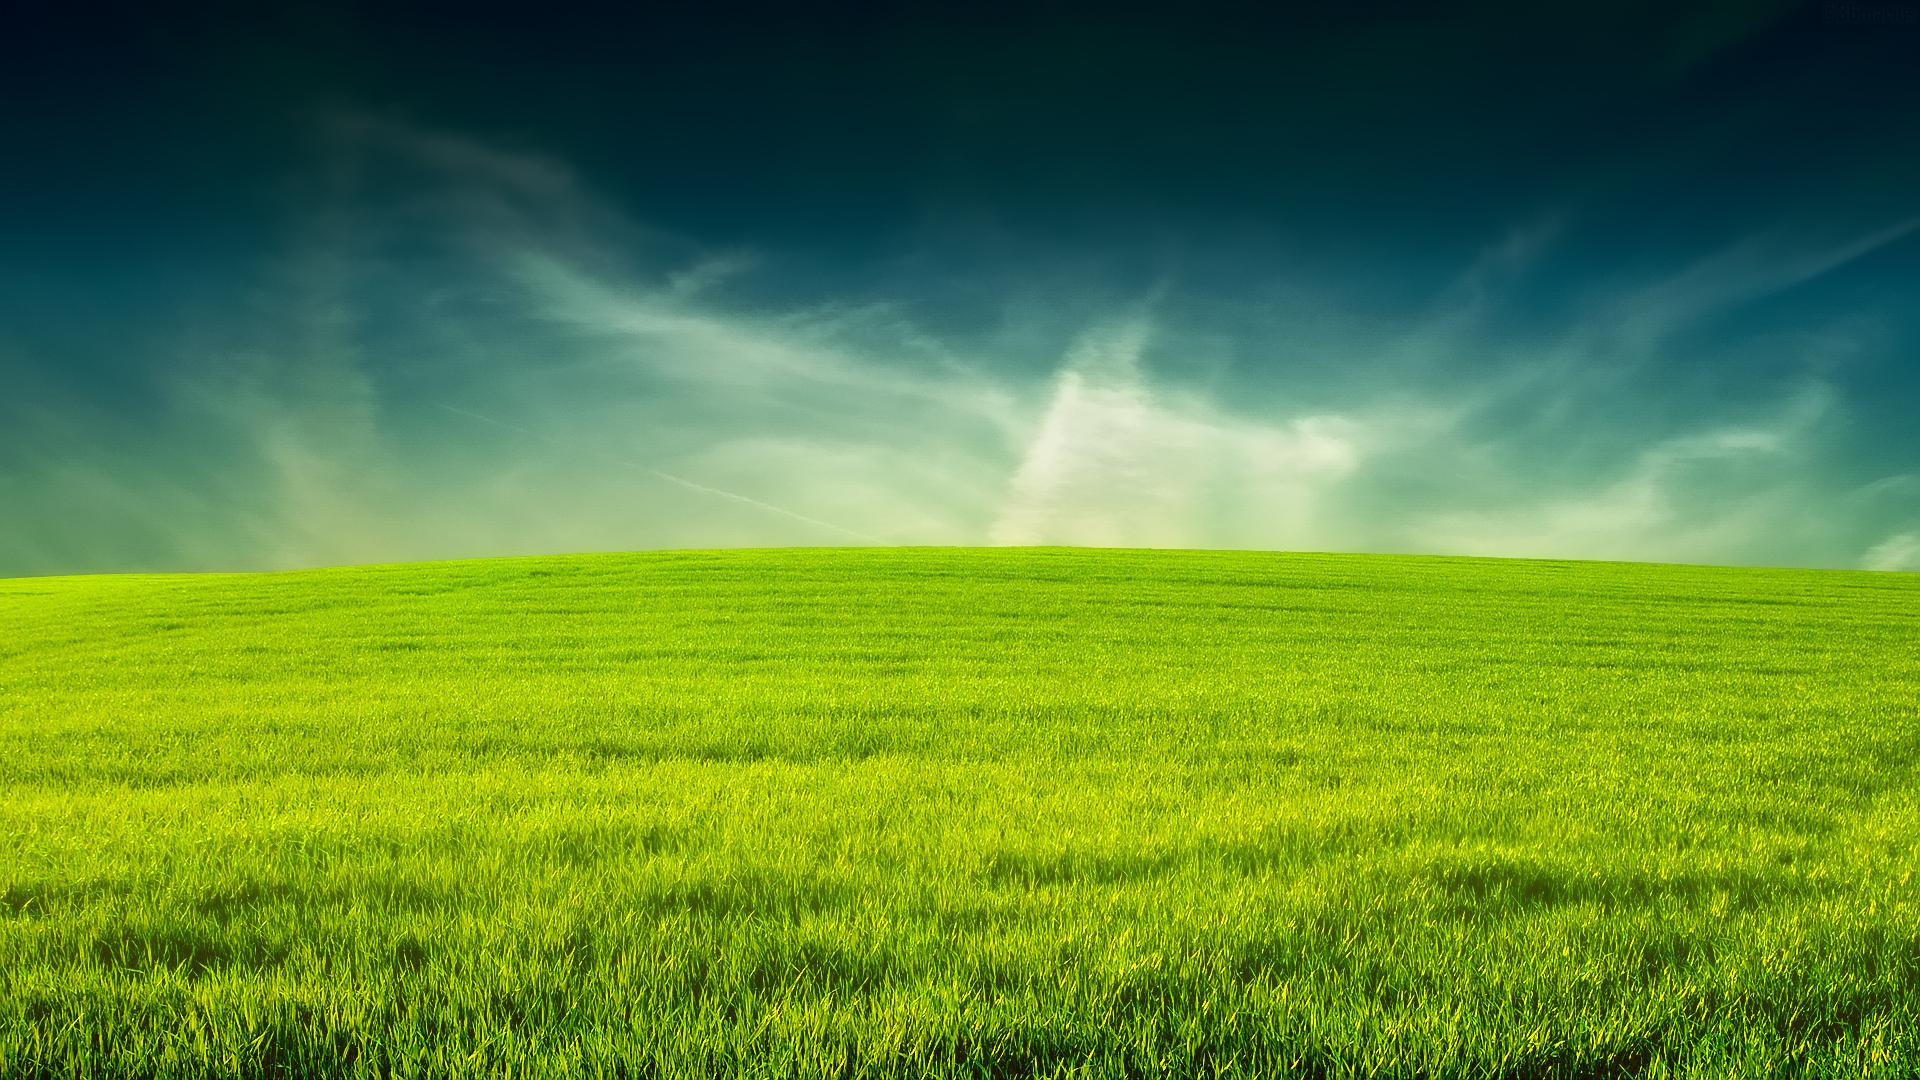 The lord s day sabbath god 39 s grace god 39 s glory for Grass landscape